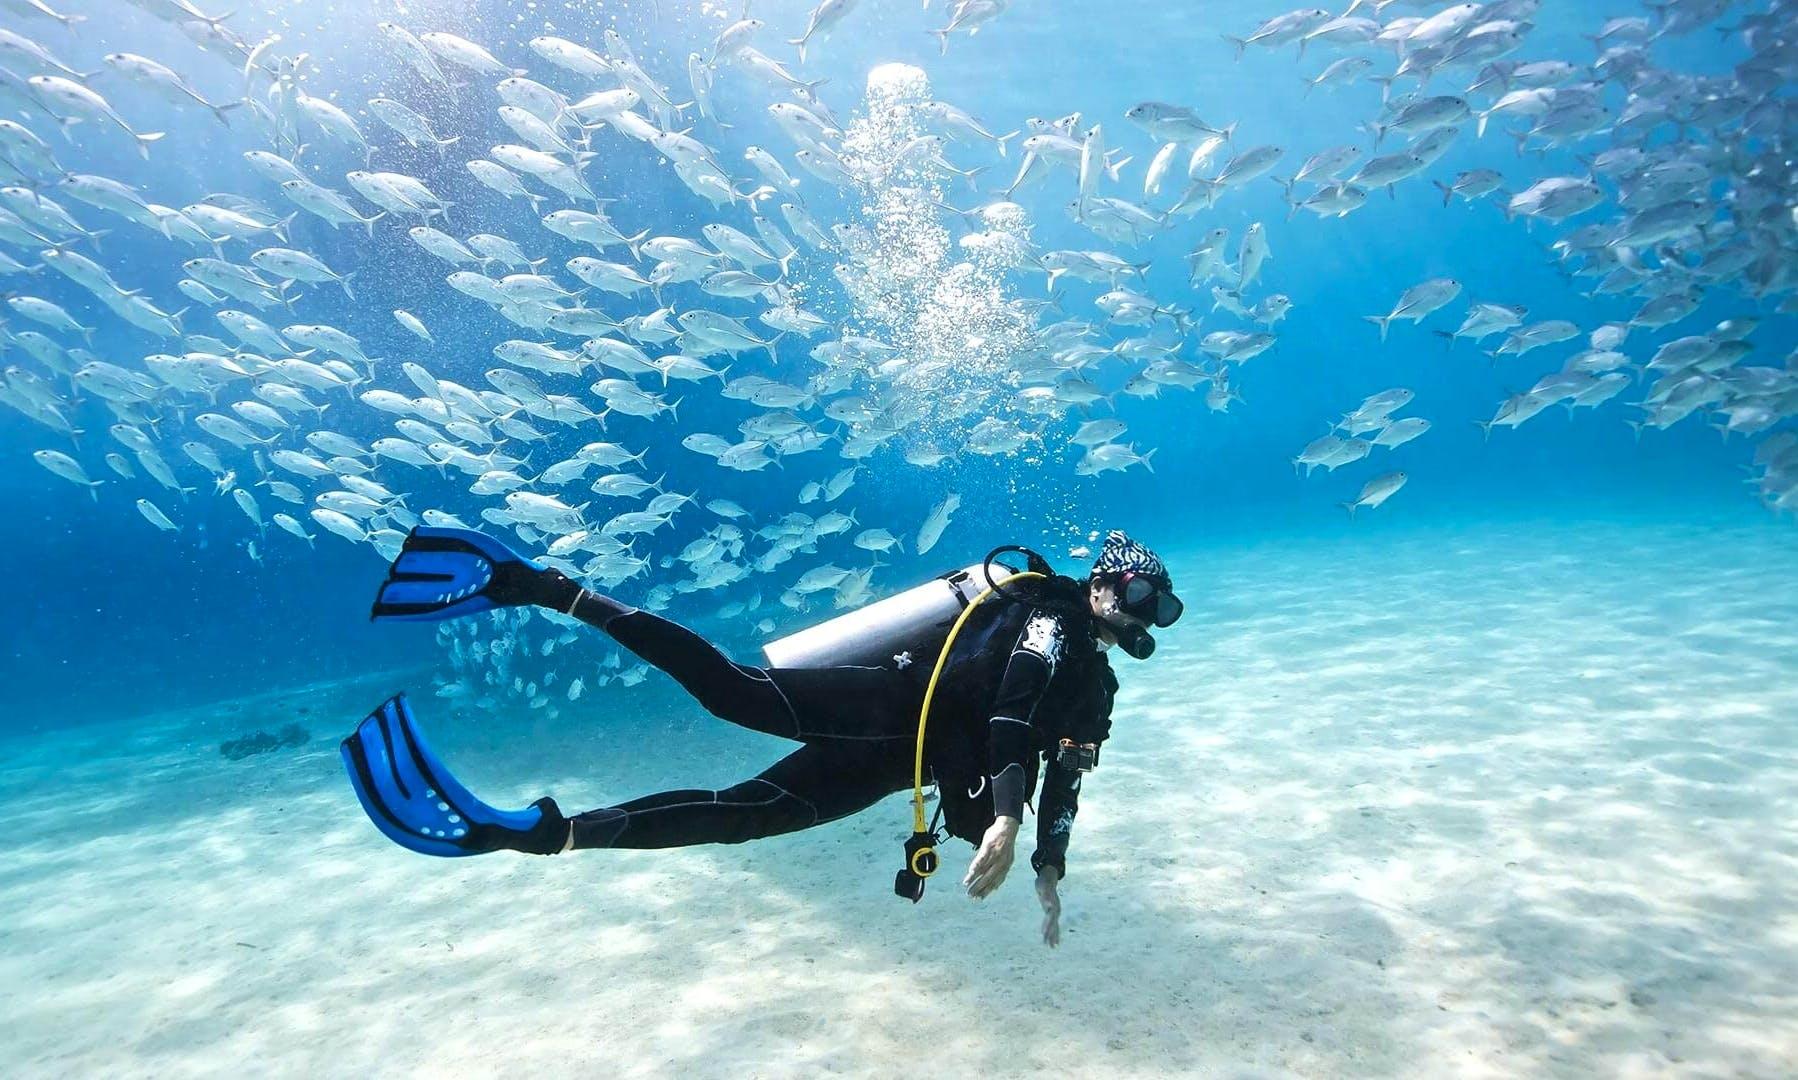 Enjoy Diving Lessons in Lochau, Austria